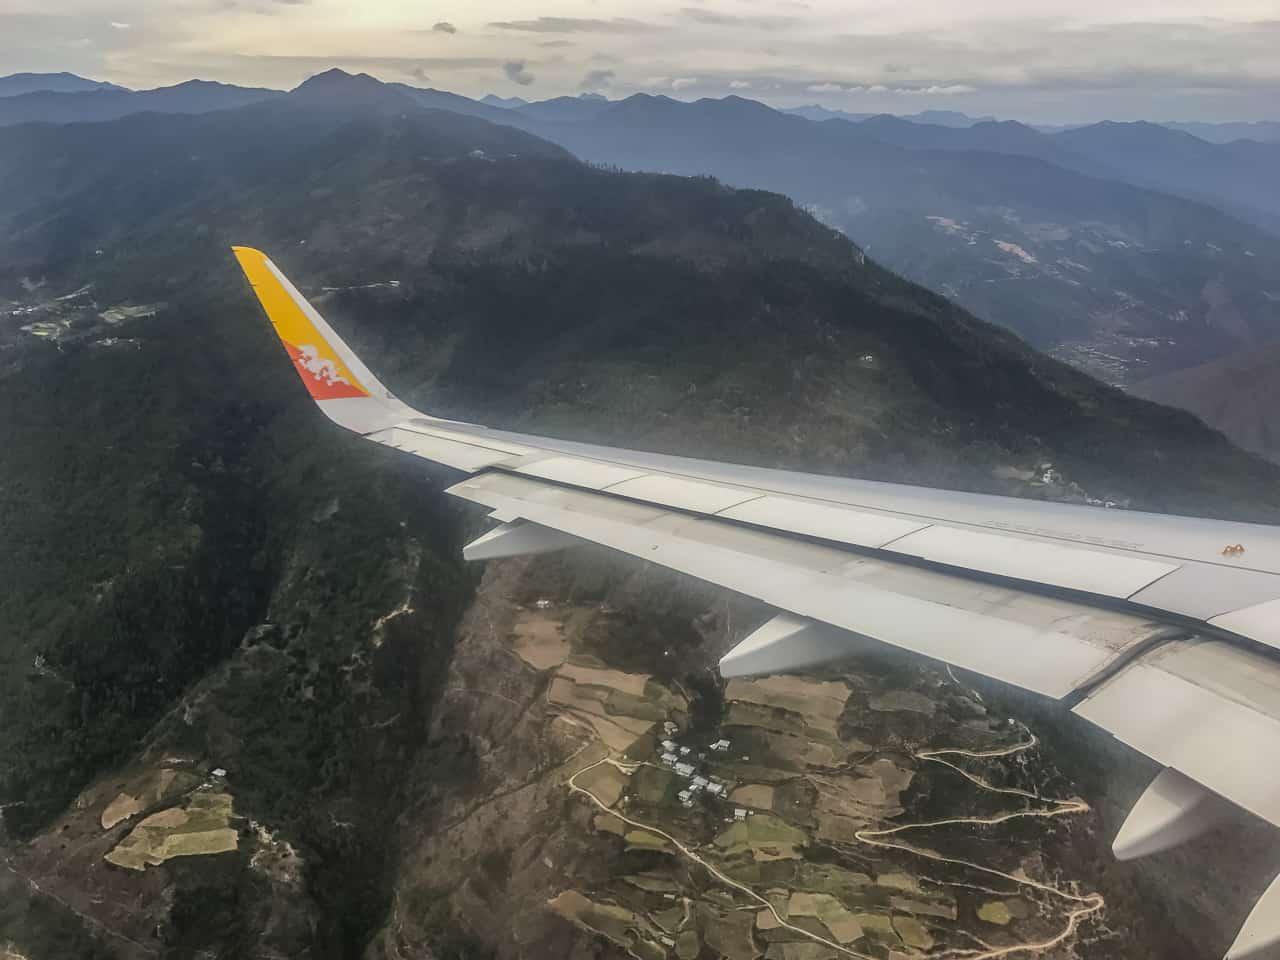 Flying int Paro to start our Bhutan Trek to Laya